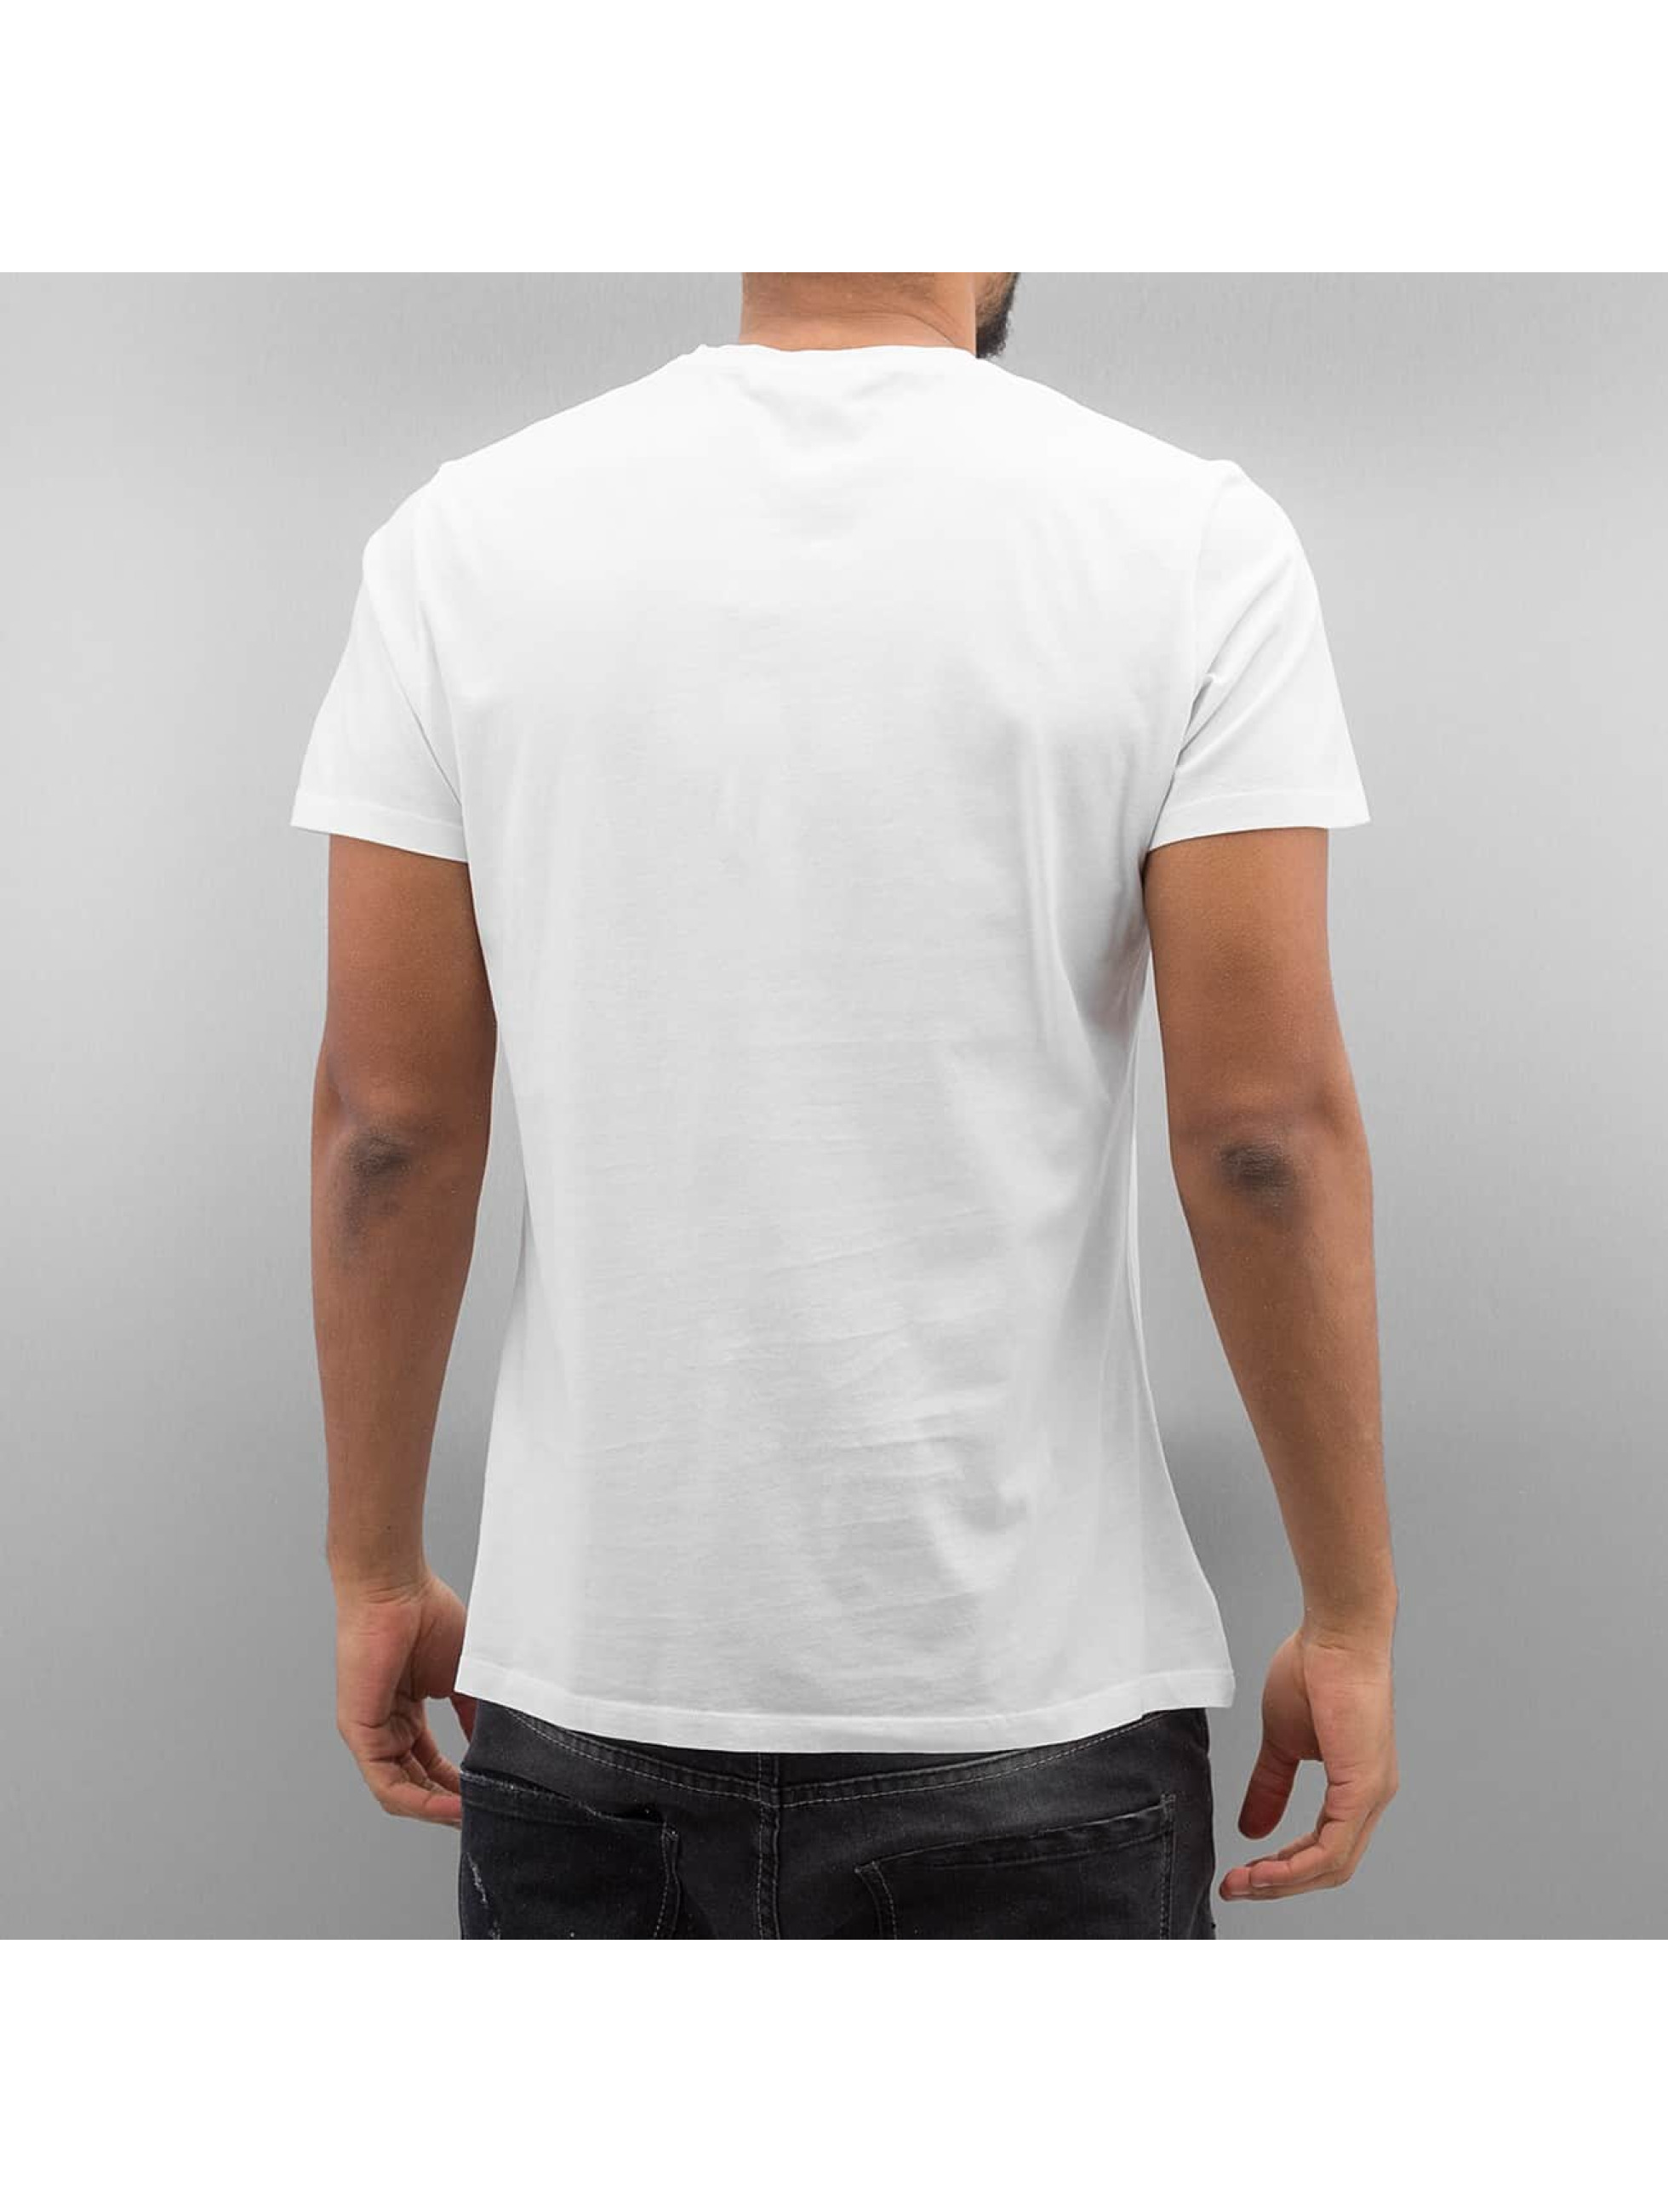 French Kick T-Shirt Iconoclaste white